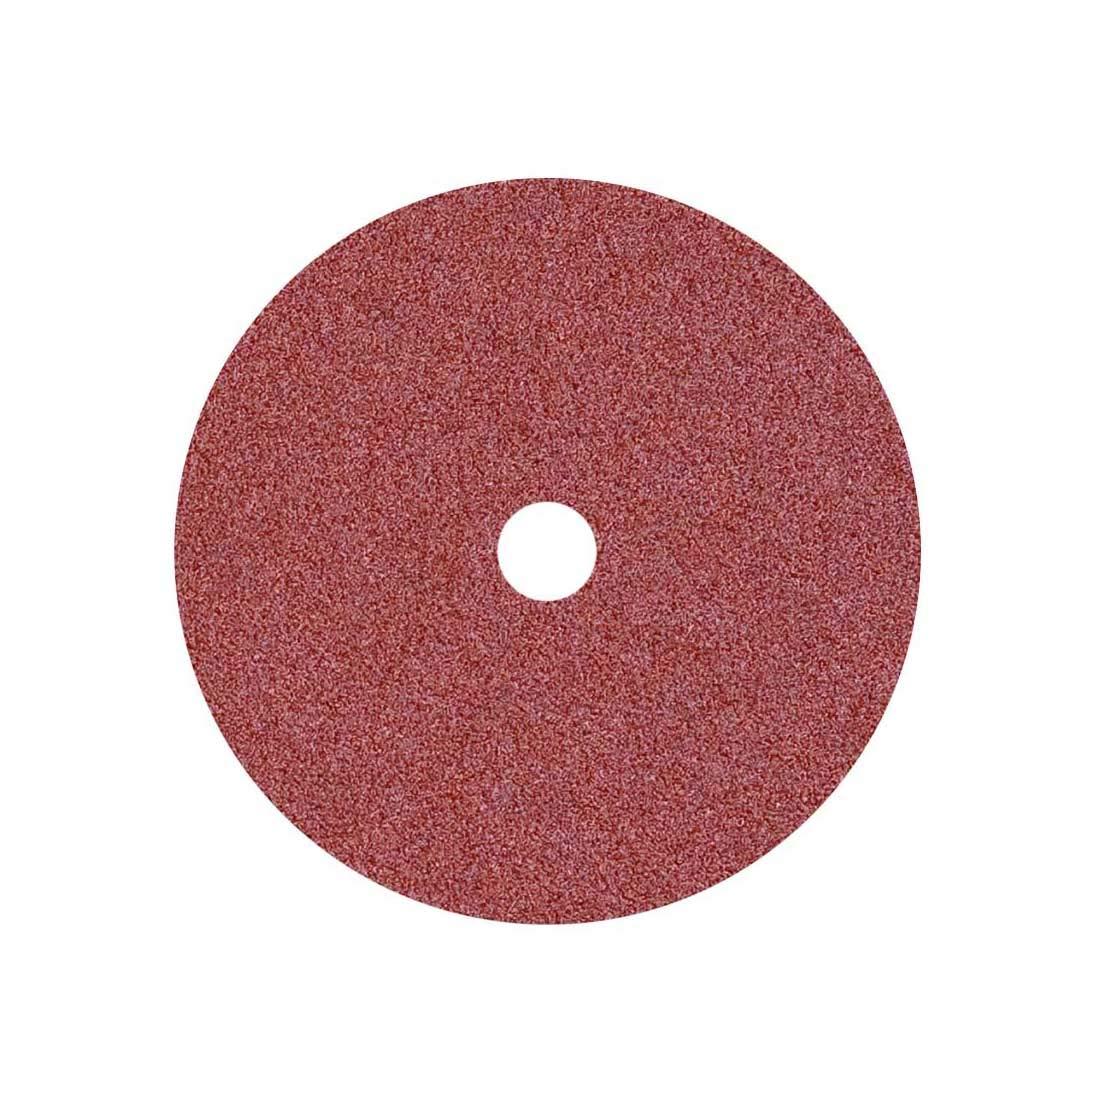 Grana 60 25 mm /Ø 406 mm 10 Dischi abrasivi MioTools per monospazzole